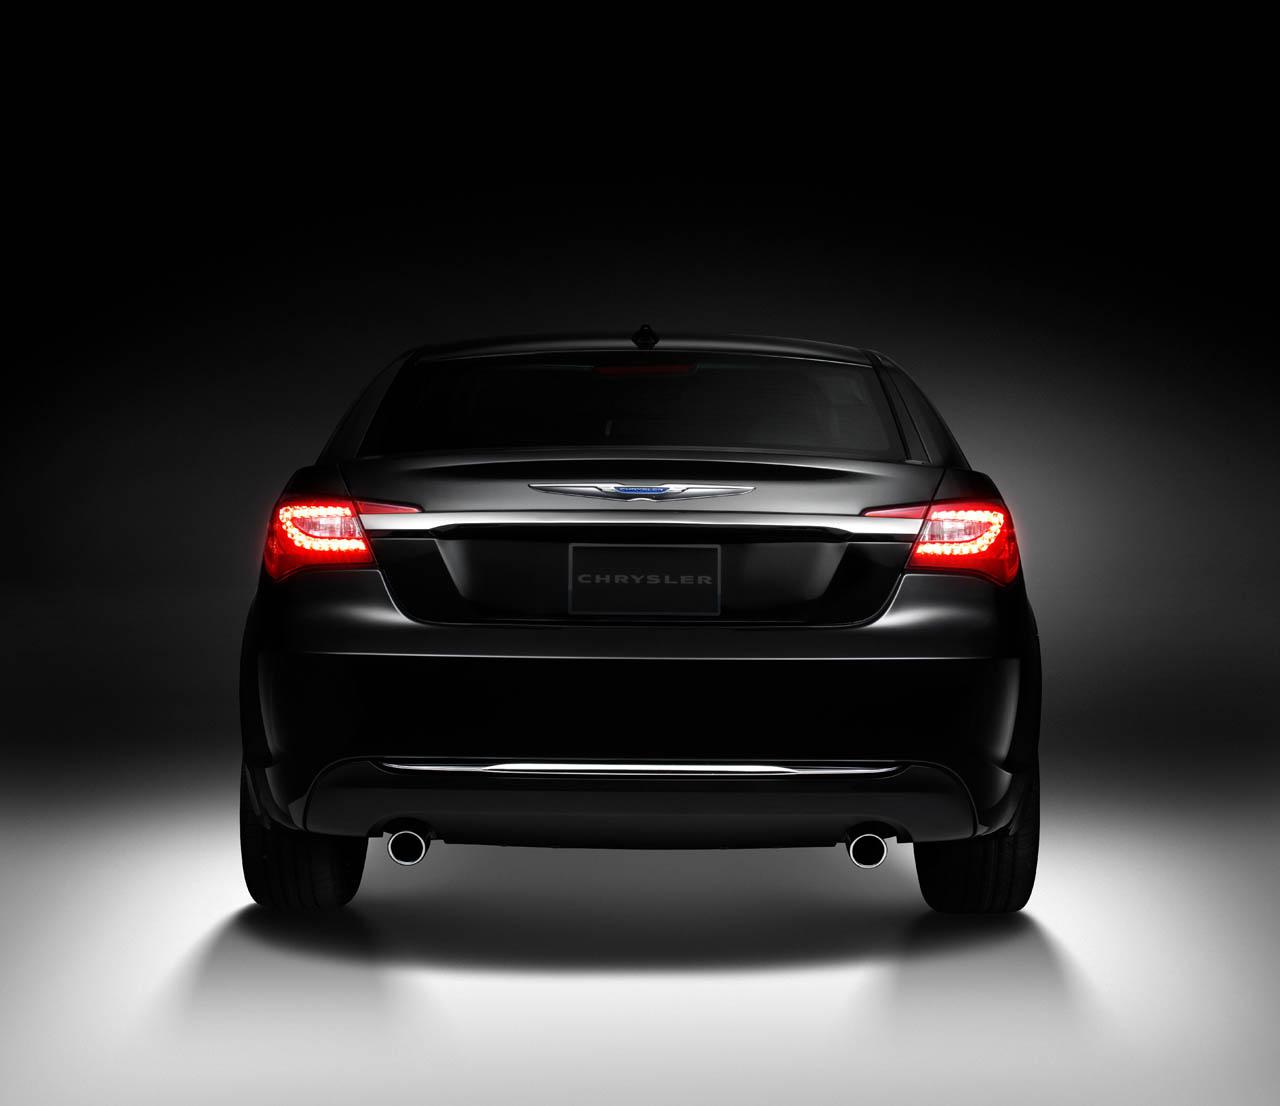 2012 Chrysler 200 LX VIN Check, Specs & Recalls